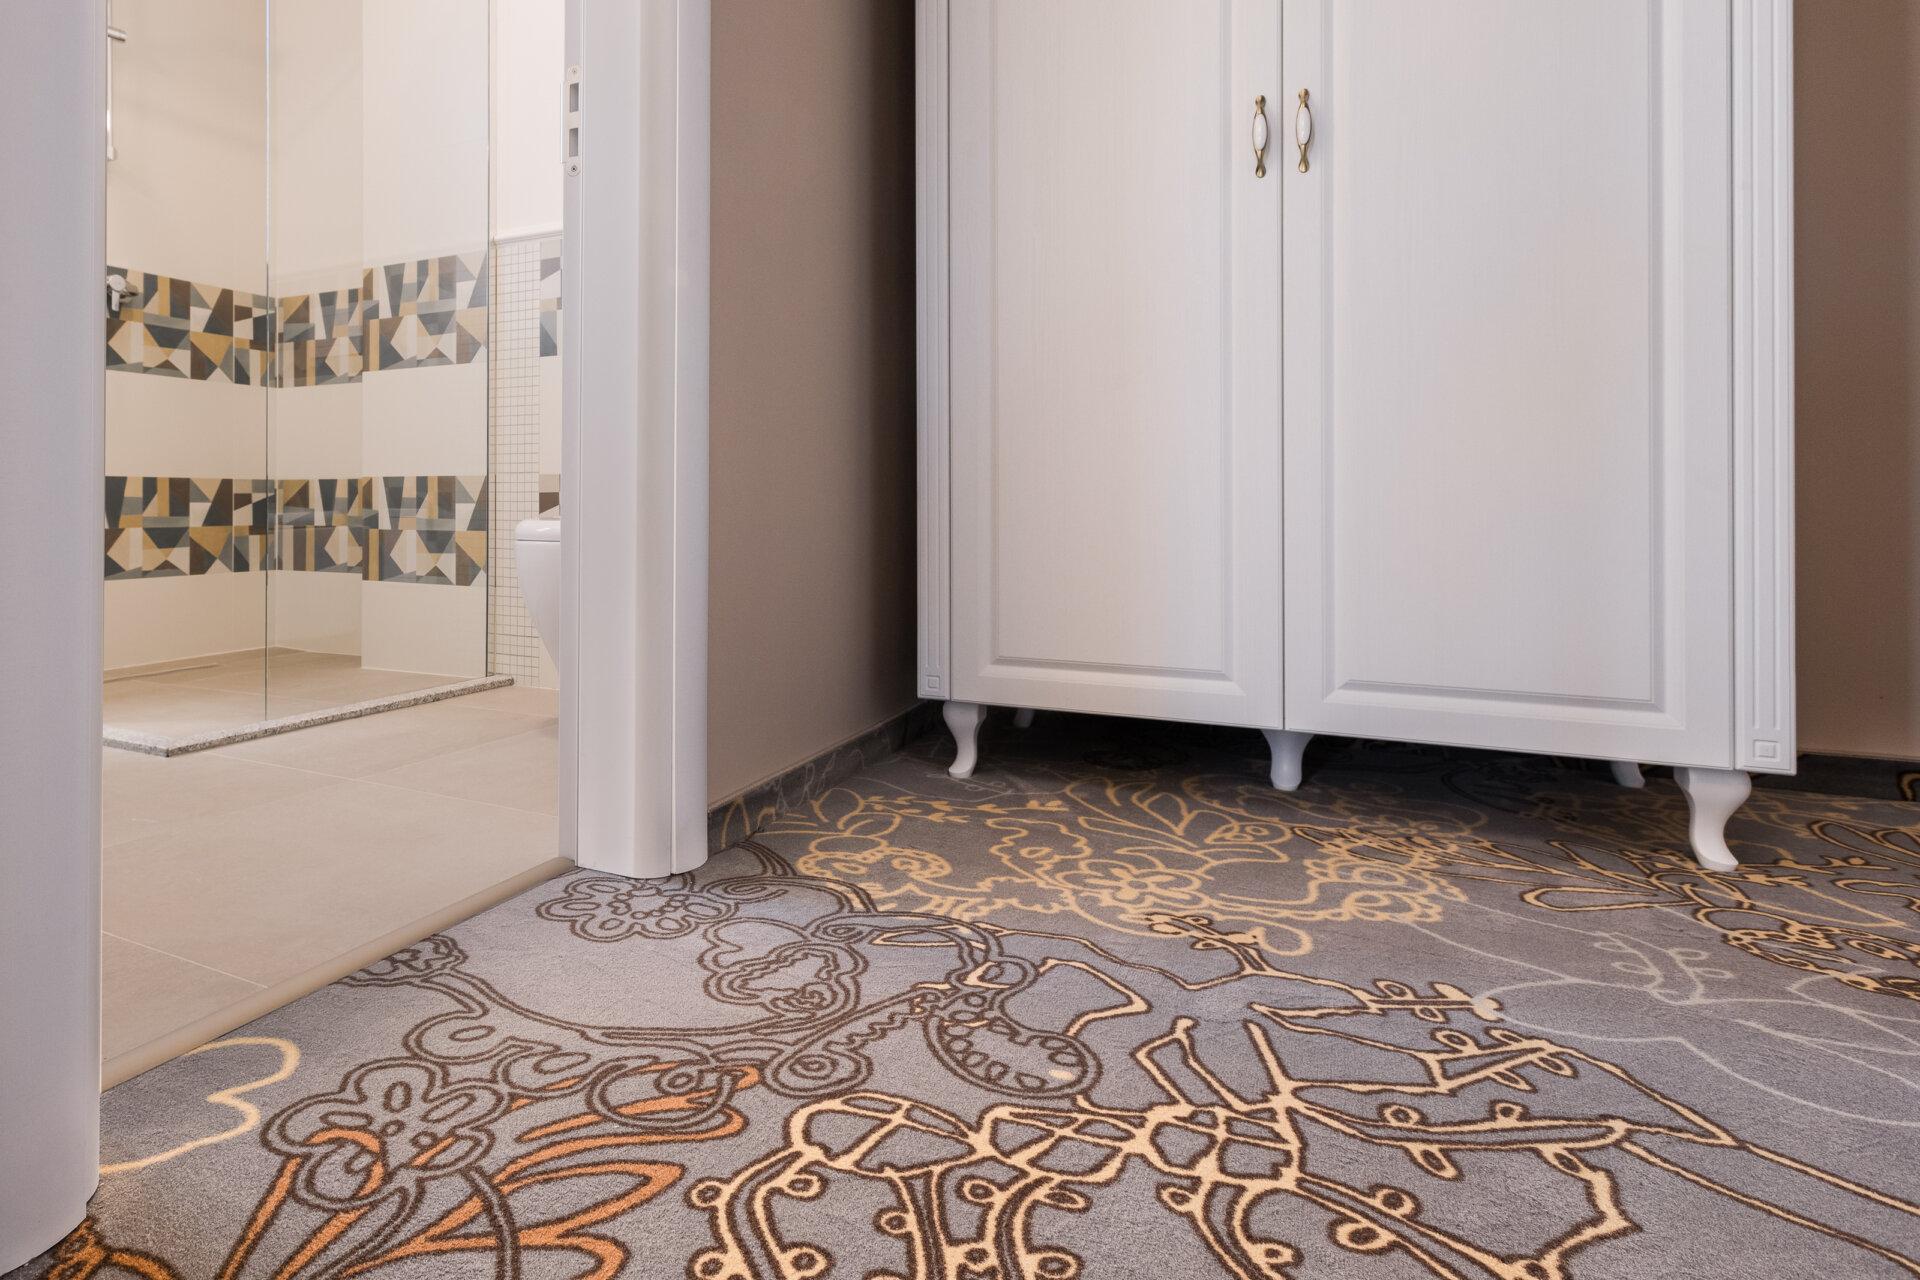 20210524-carpet&more-mamaia-hotel-scapino-junior-by-hugmedia-004